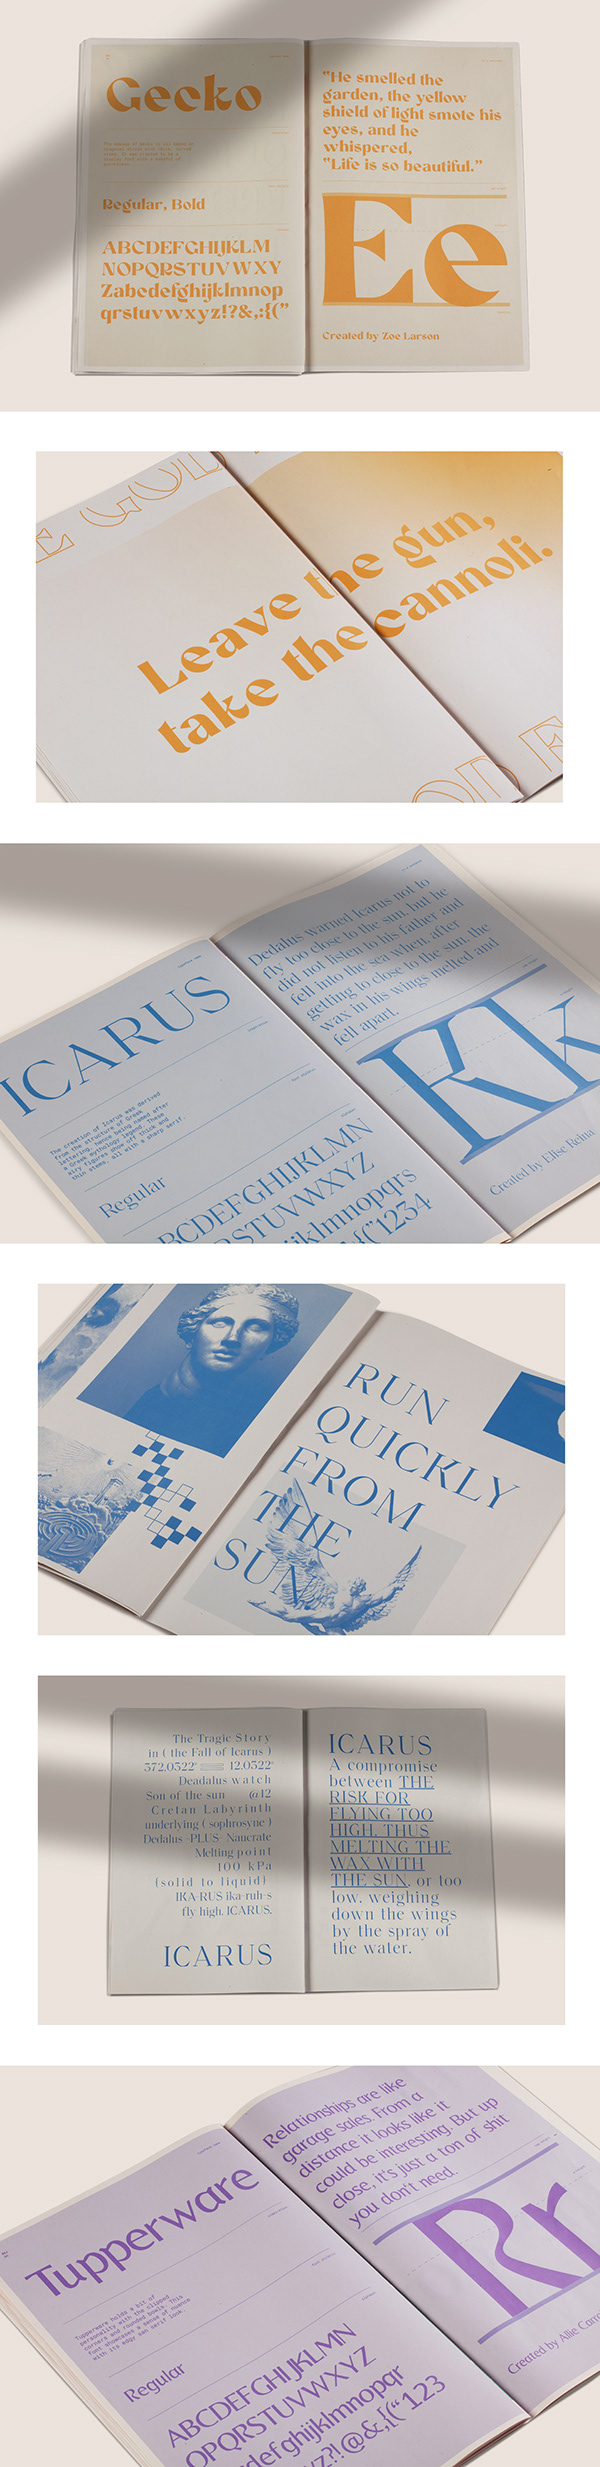 Typographic Universe - Font Specimen Promo